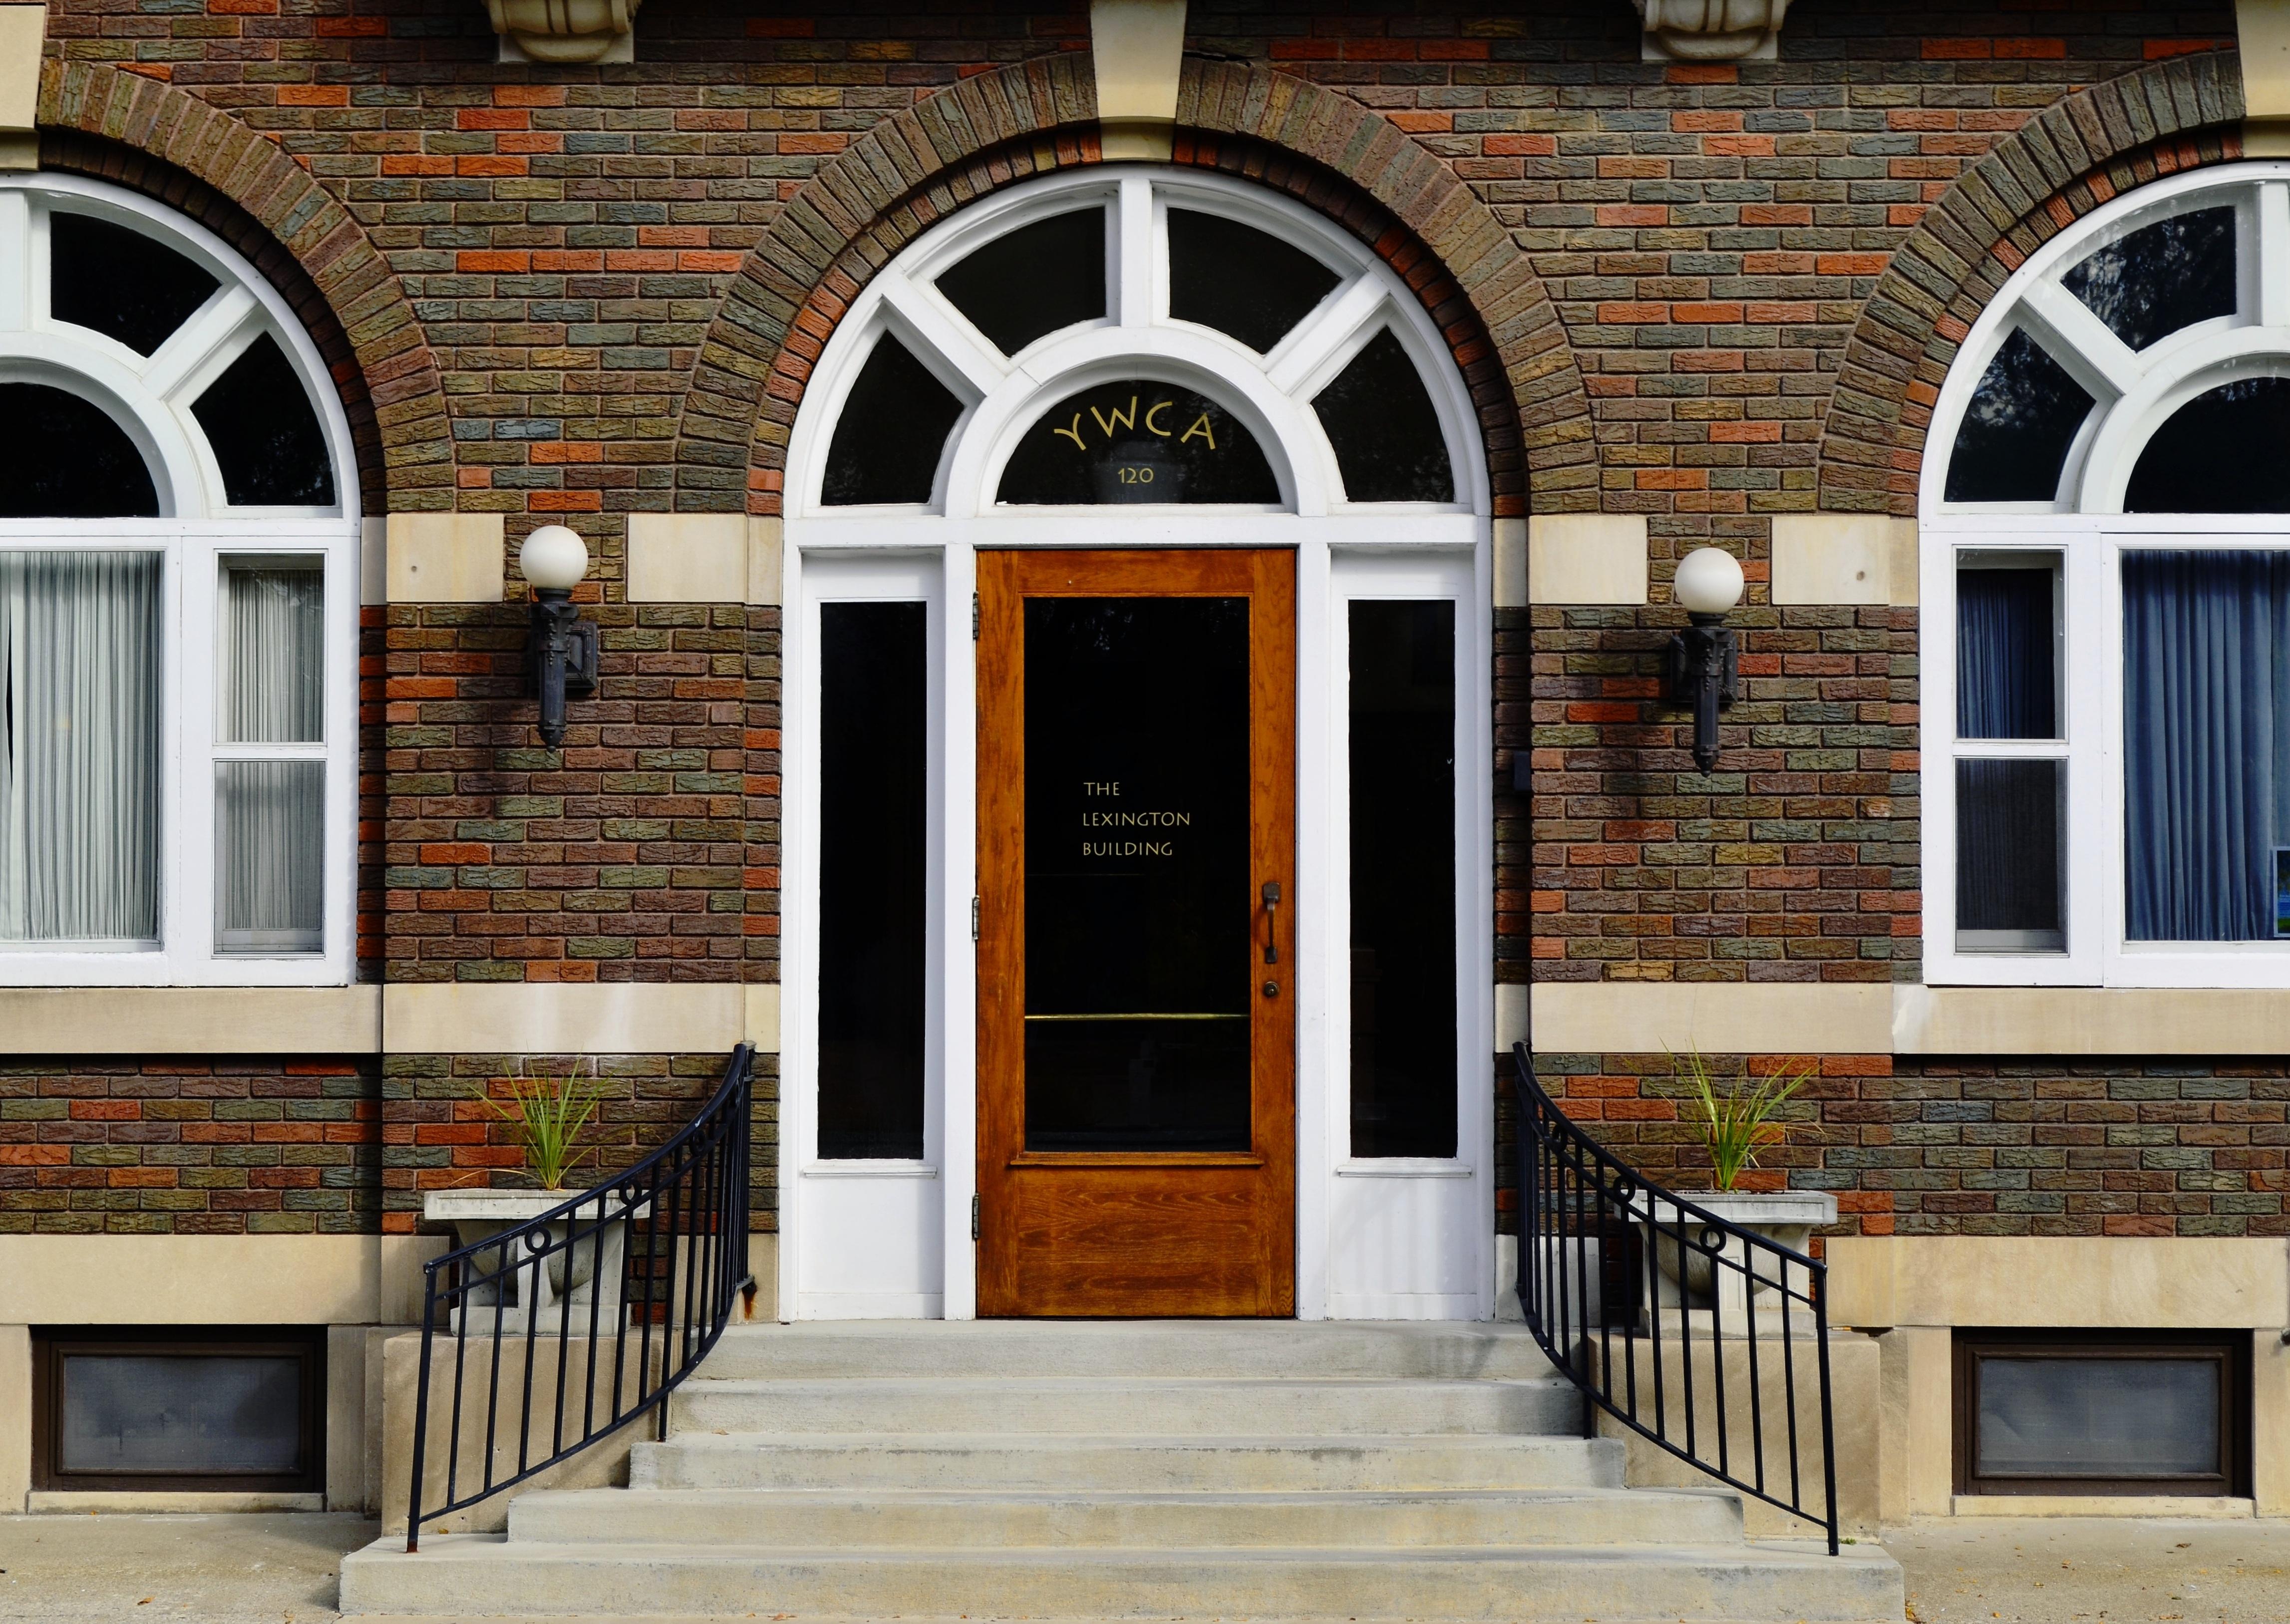 Fotos gratis arquitectura madera palacio edificio for Puertas para patio exterior